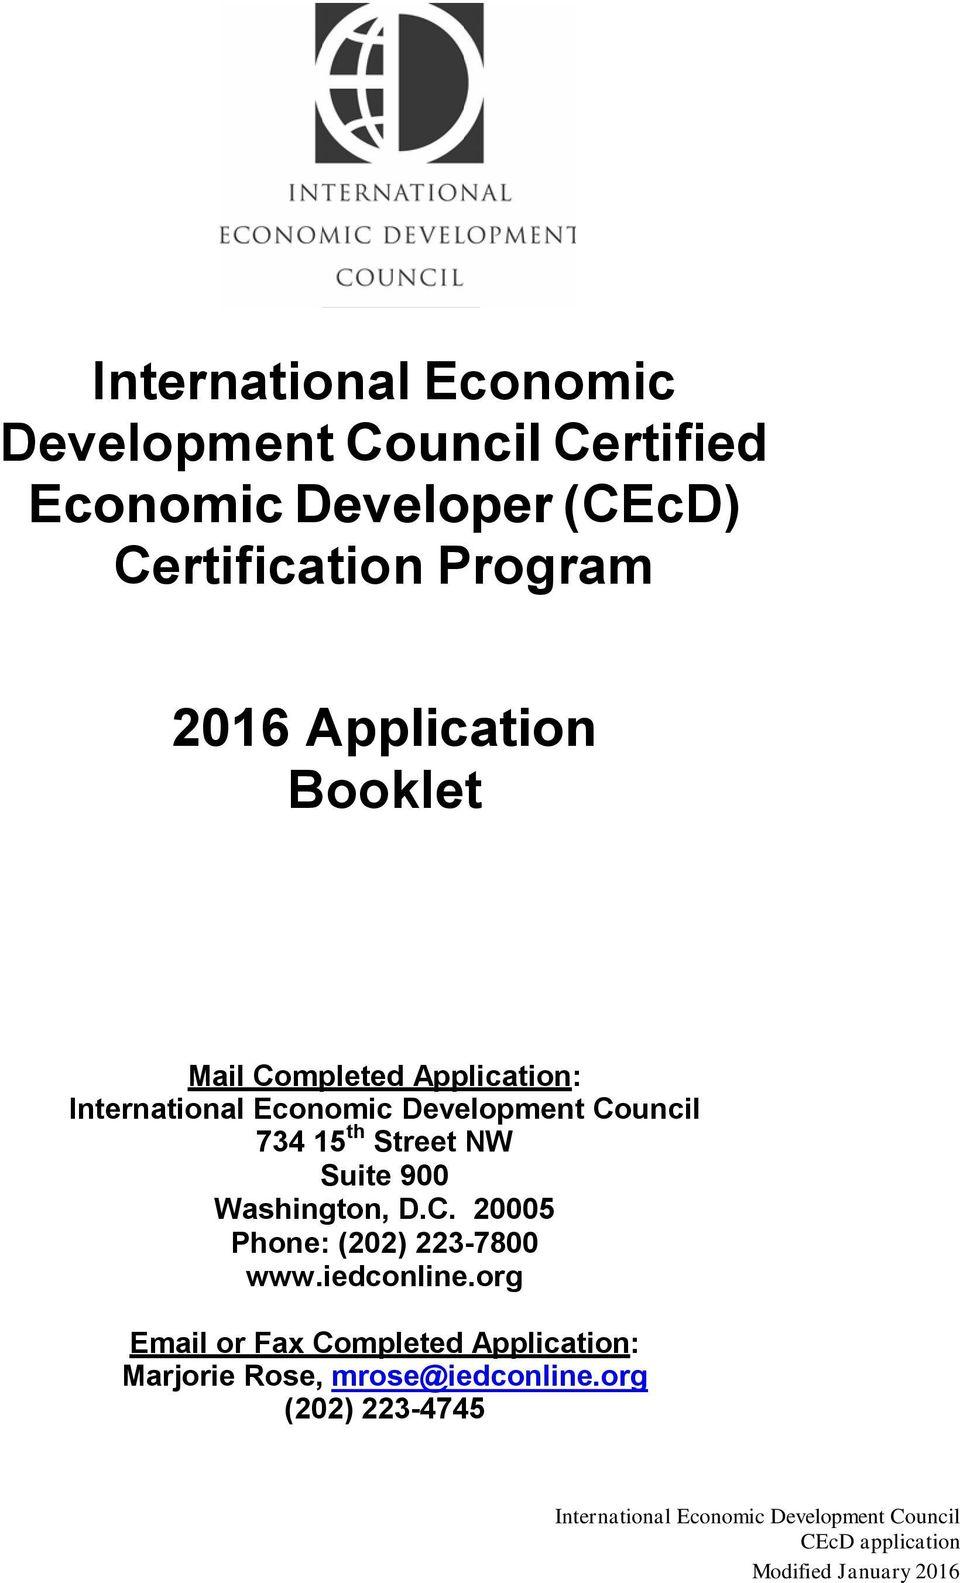 International Economic Development Council Certified